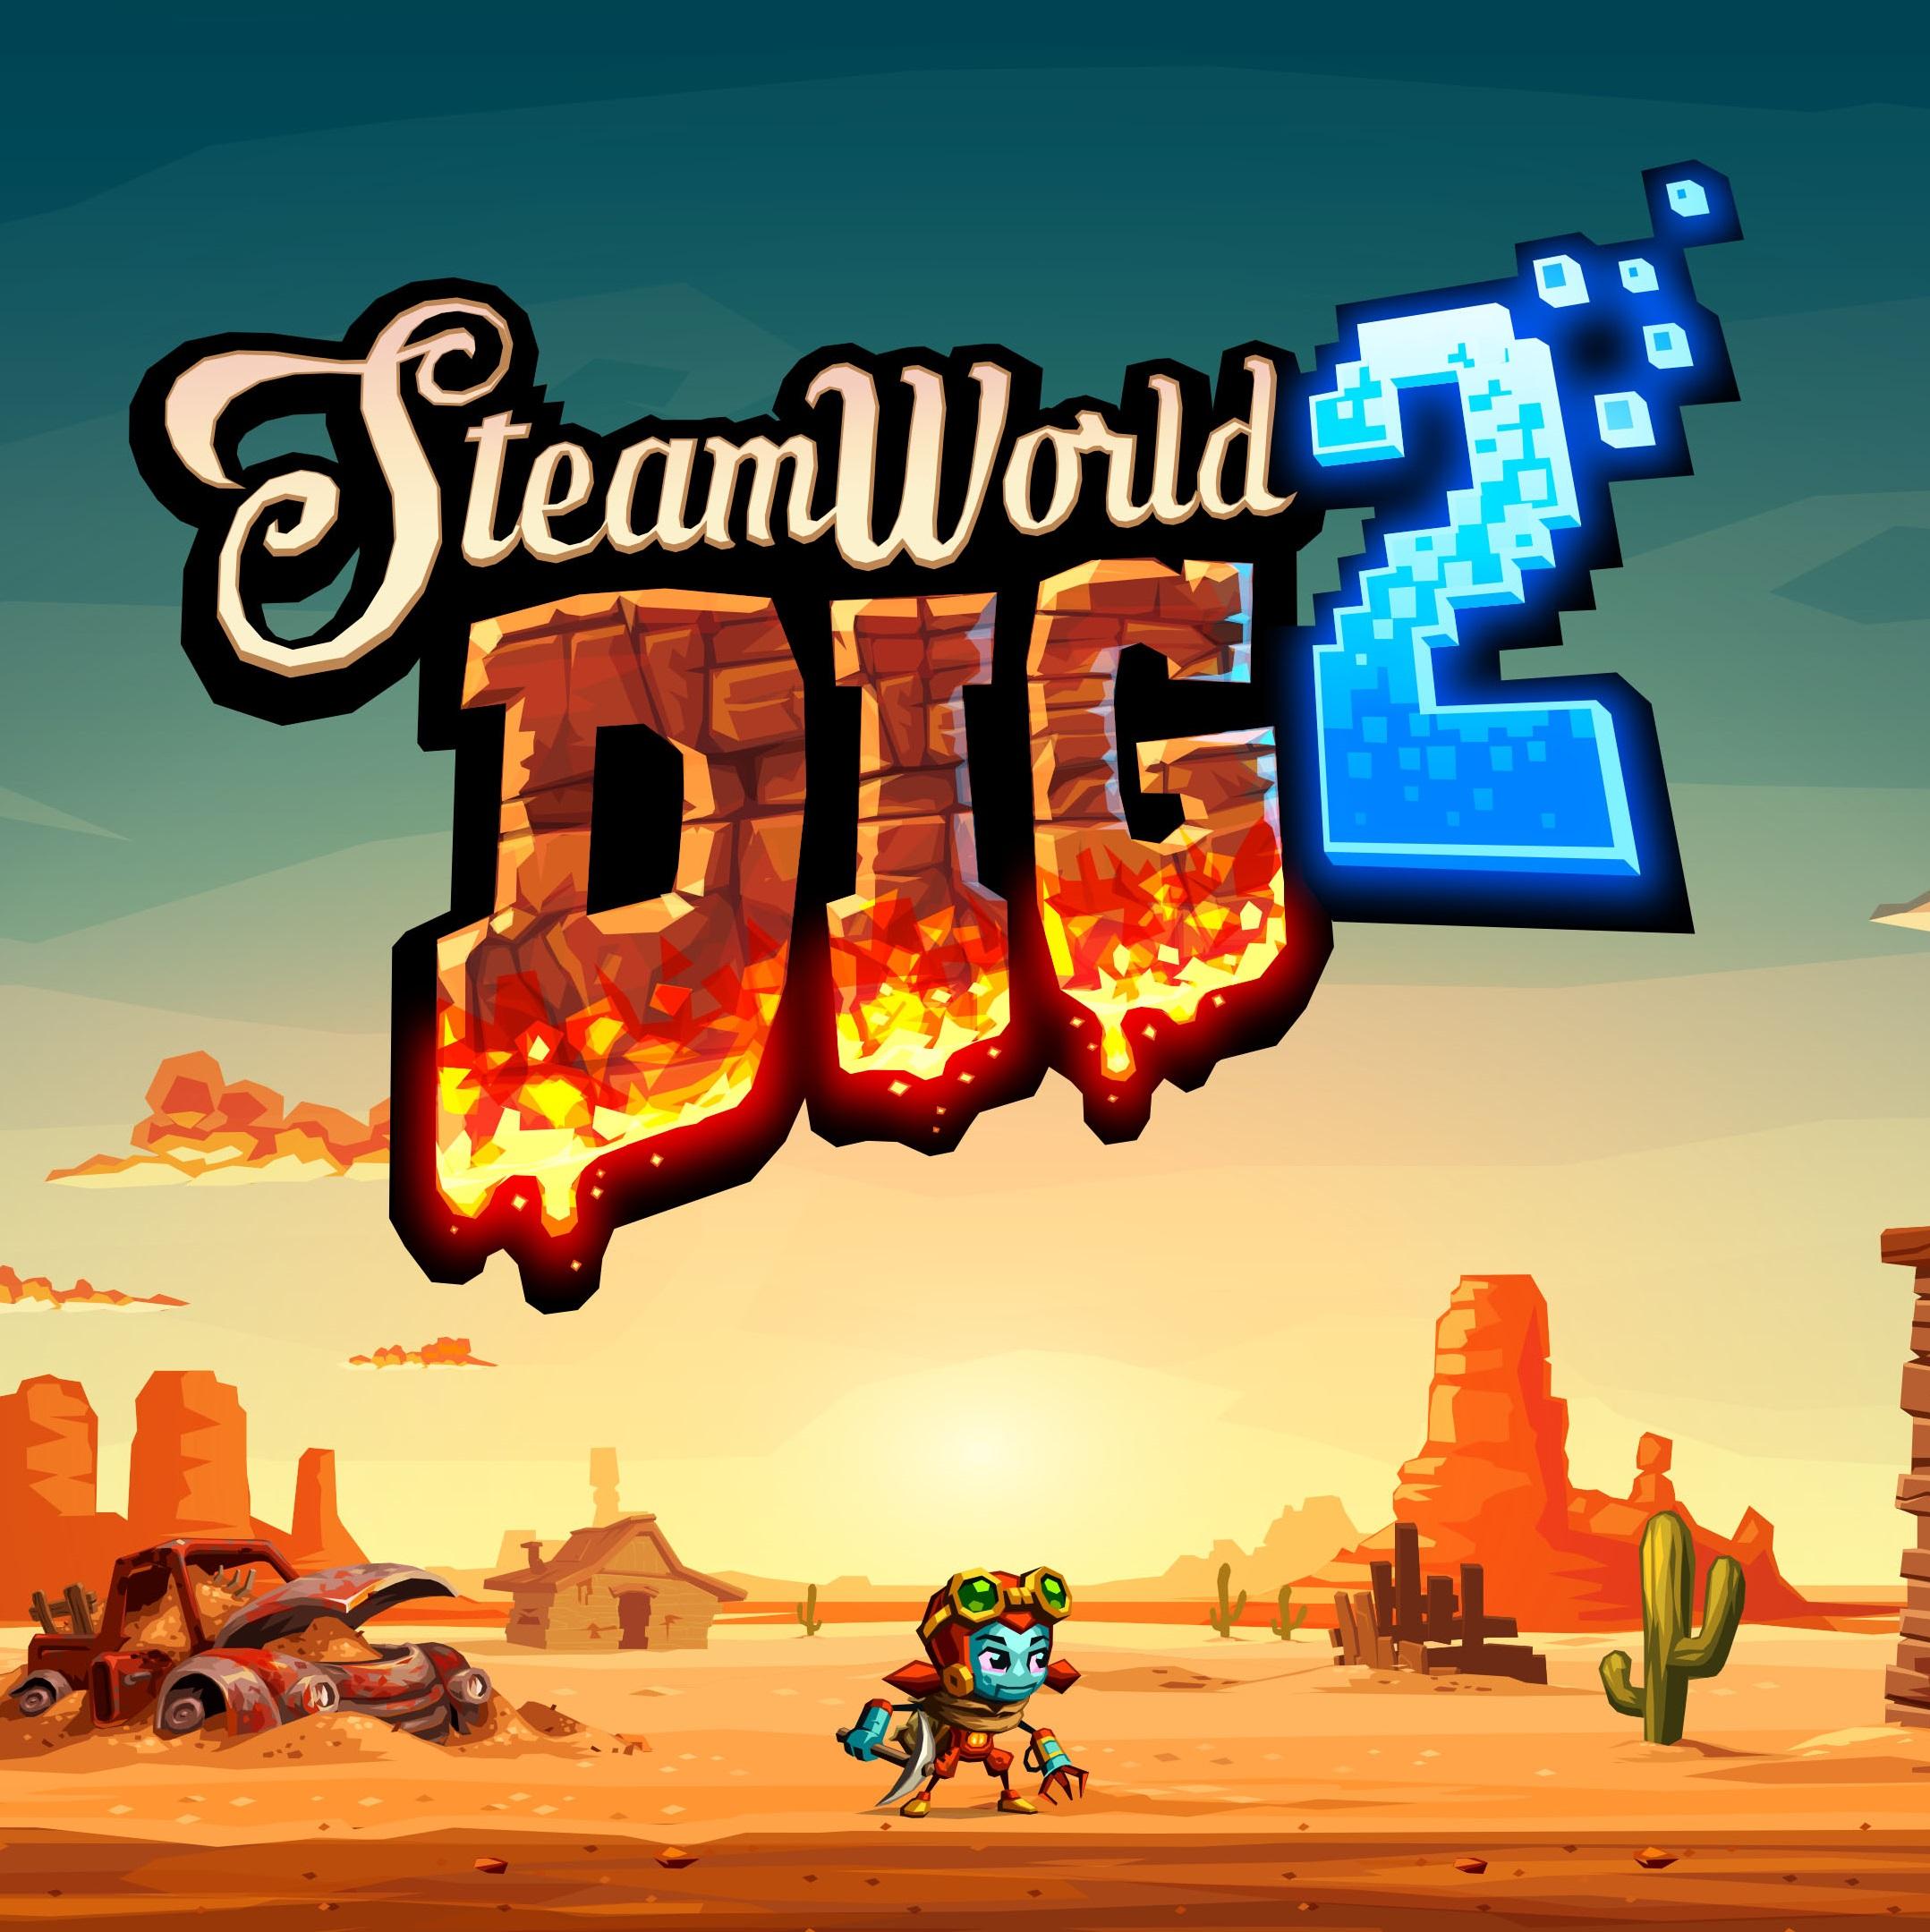 steamworld-dig-2-02-28-17-13.jpg